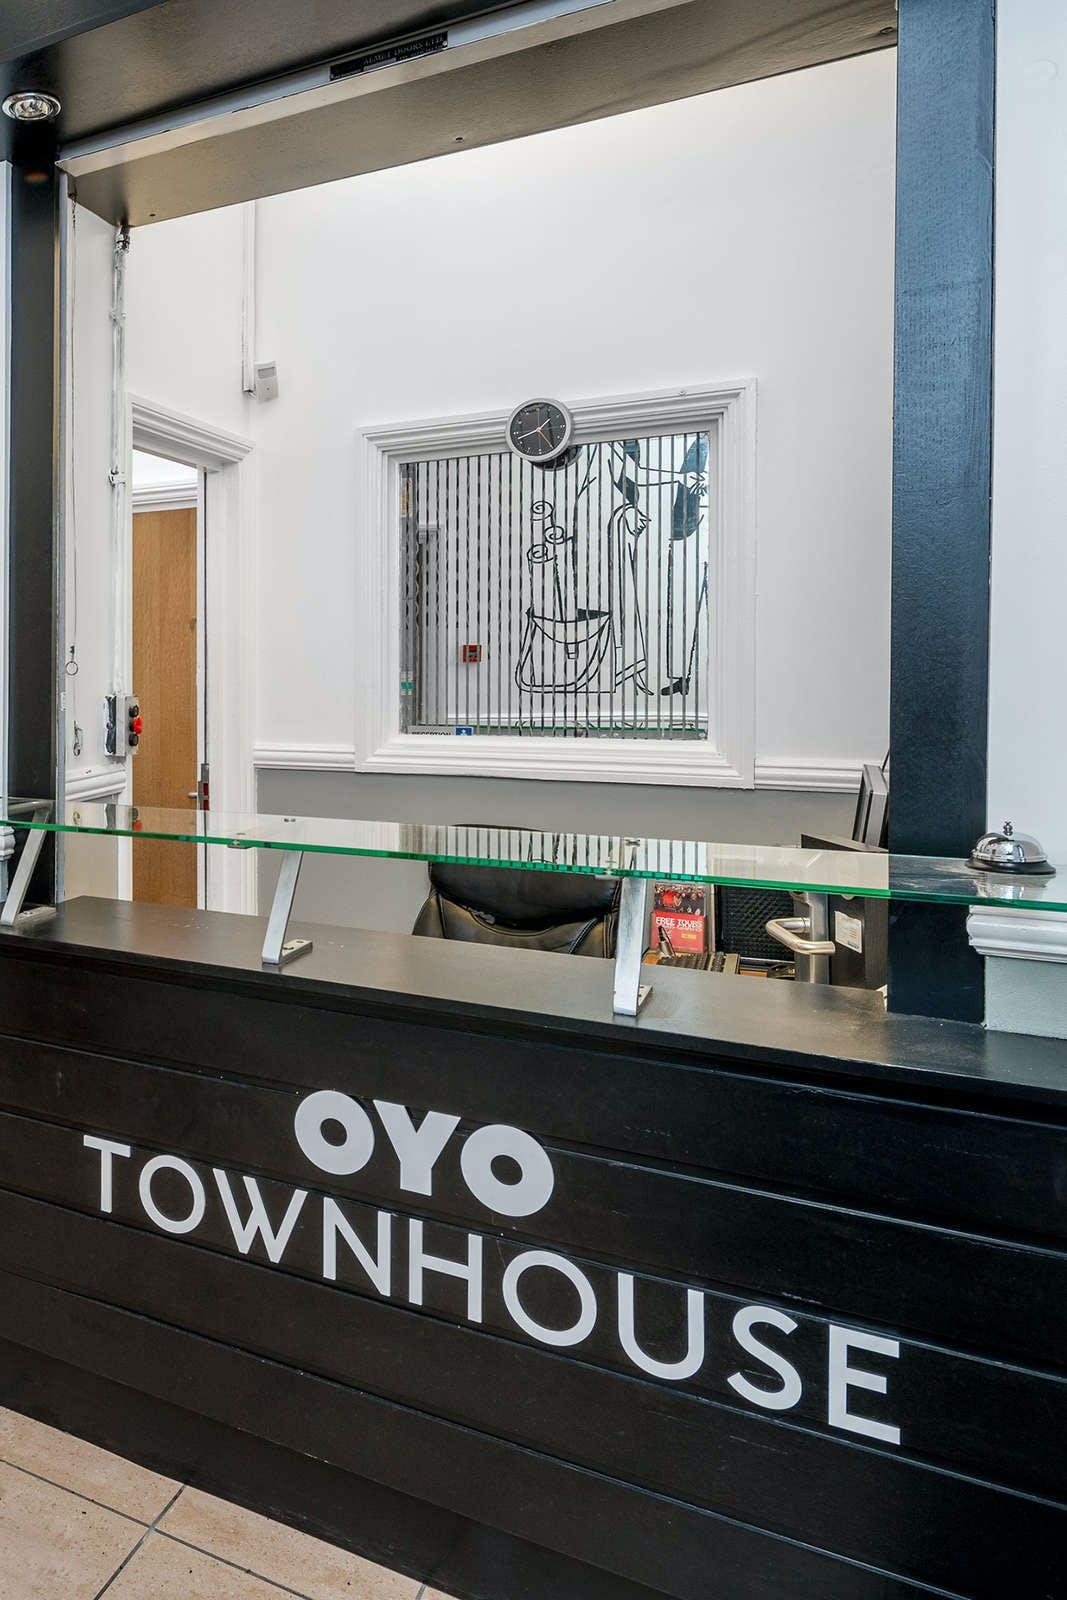 OYO Townhouse New England